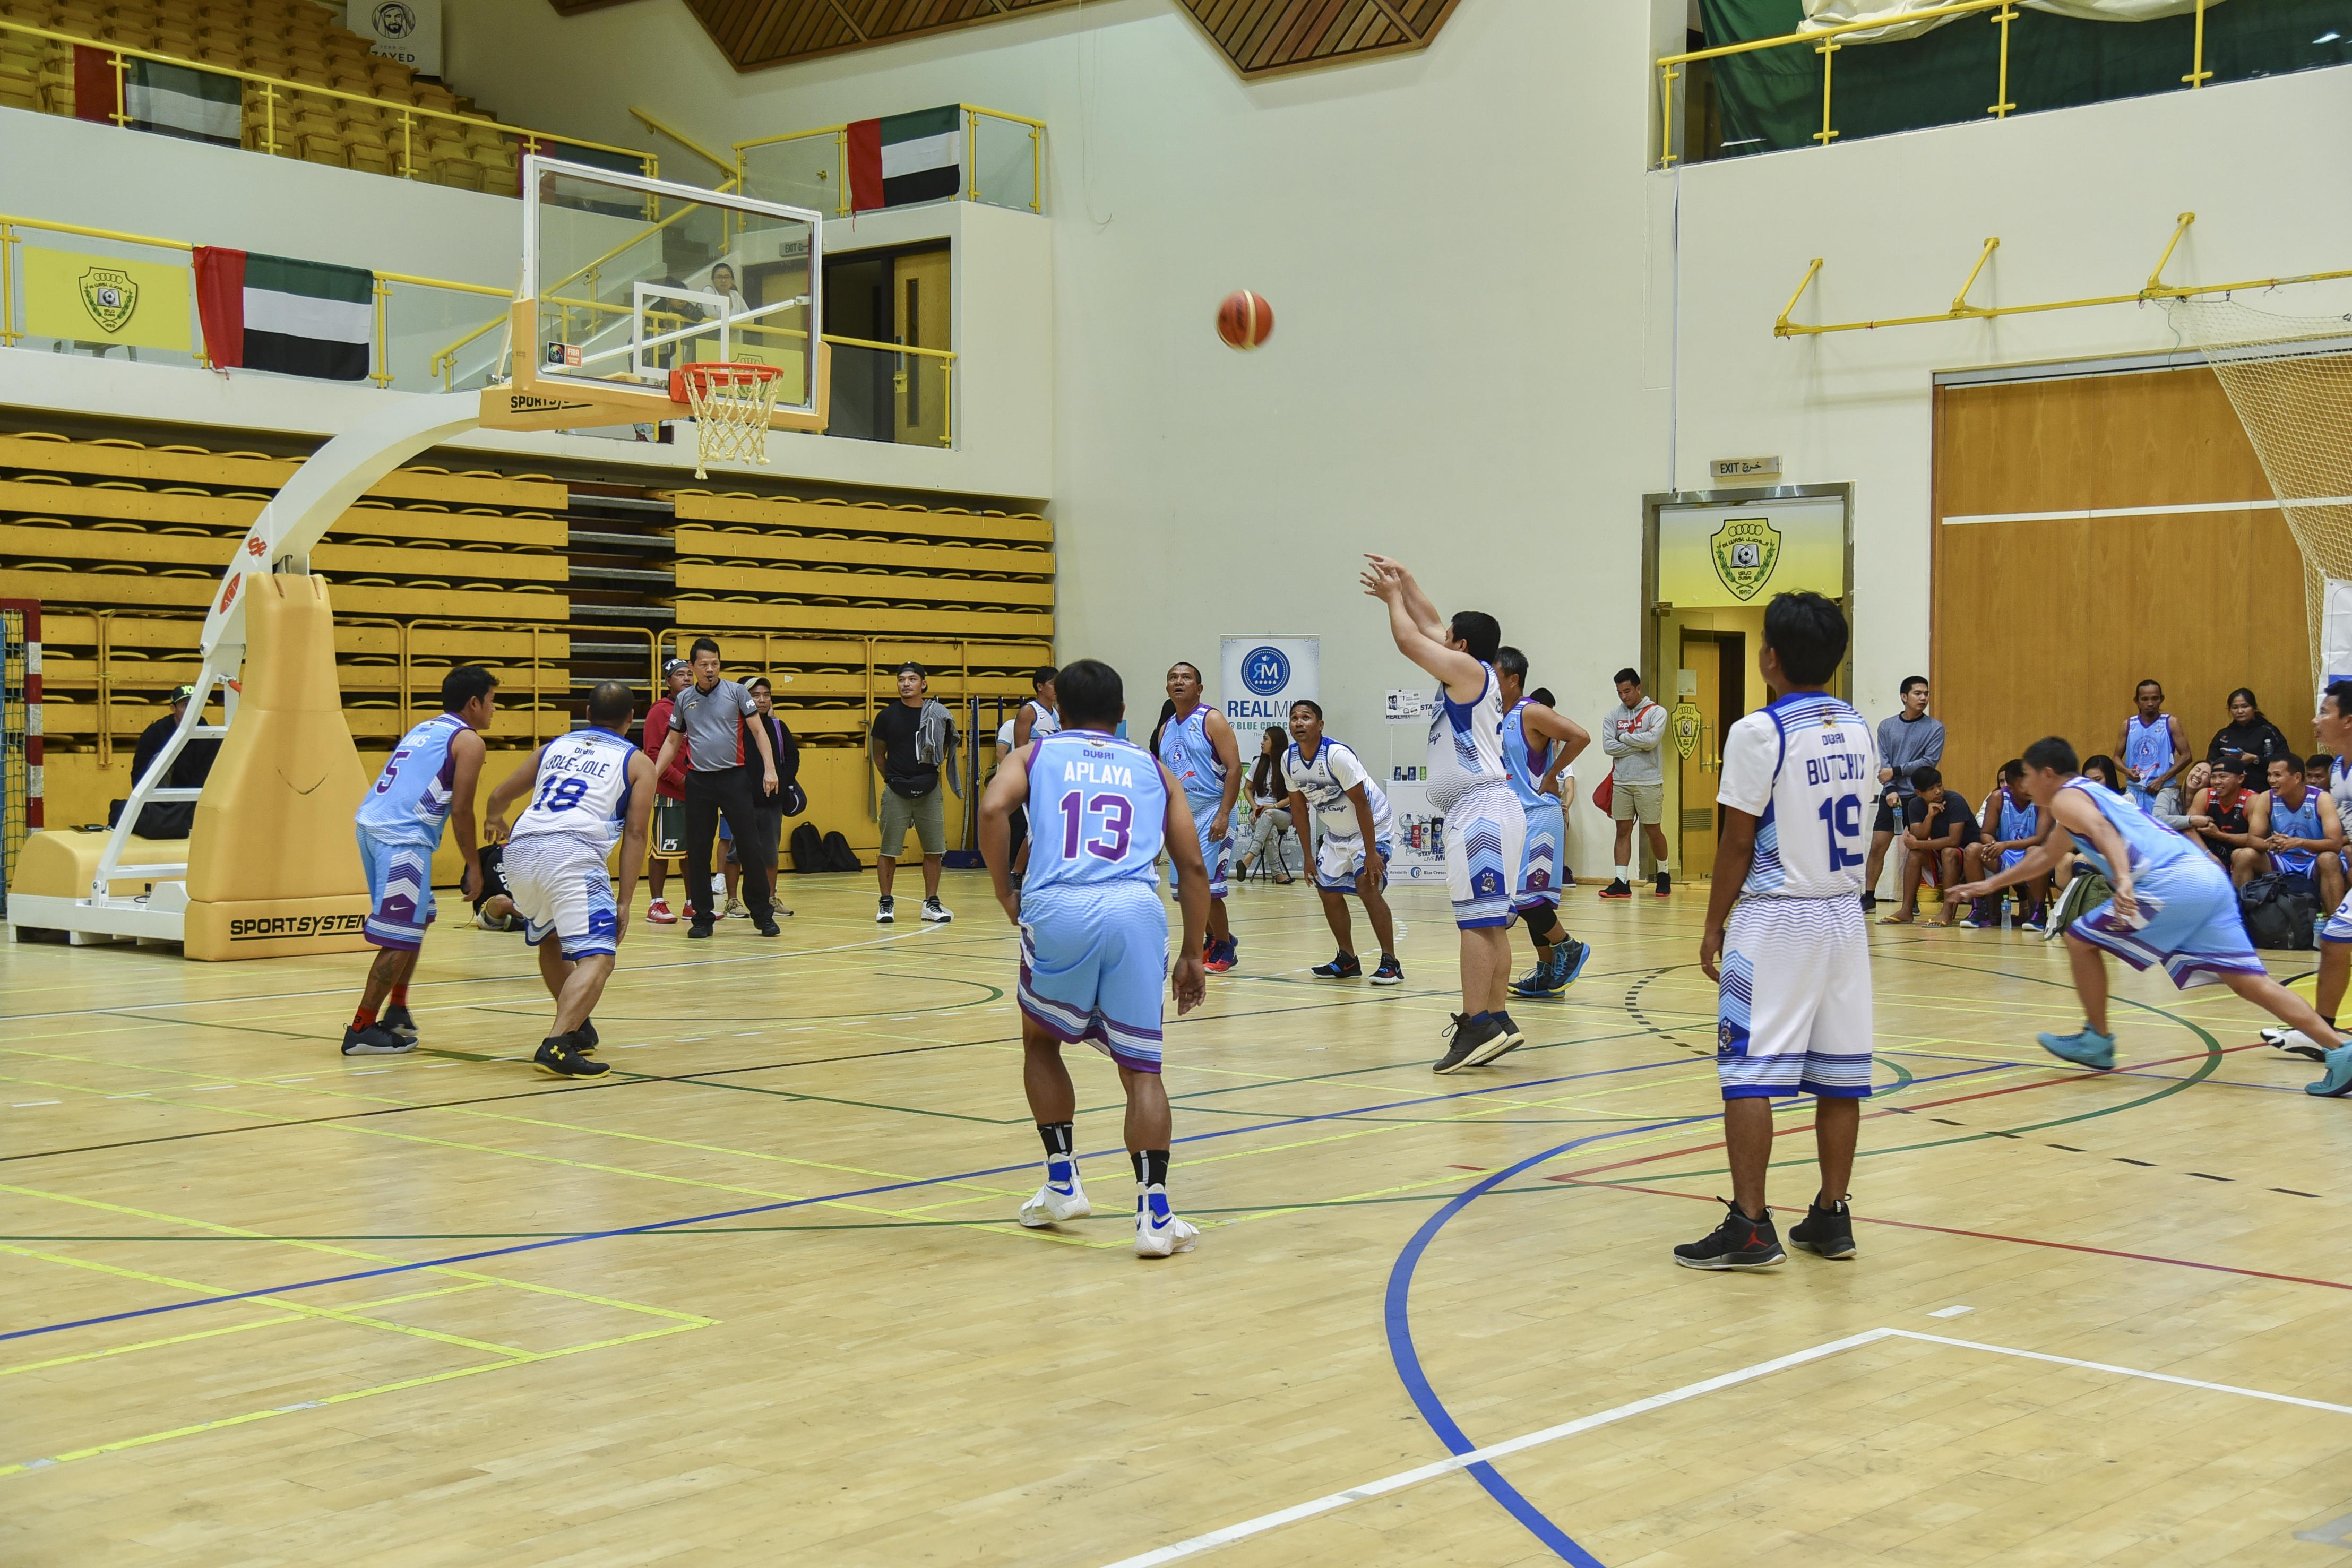 GCI at FYA Basketball Tournament Season 1 2018 Opening (13).jpg